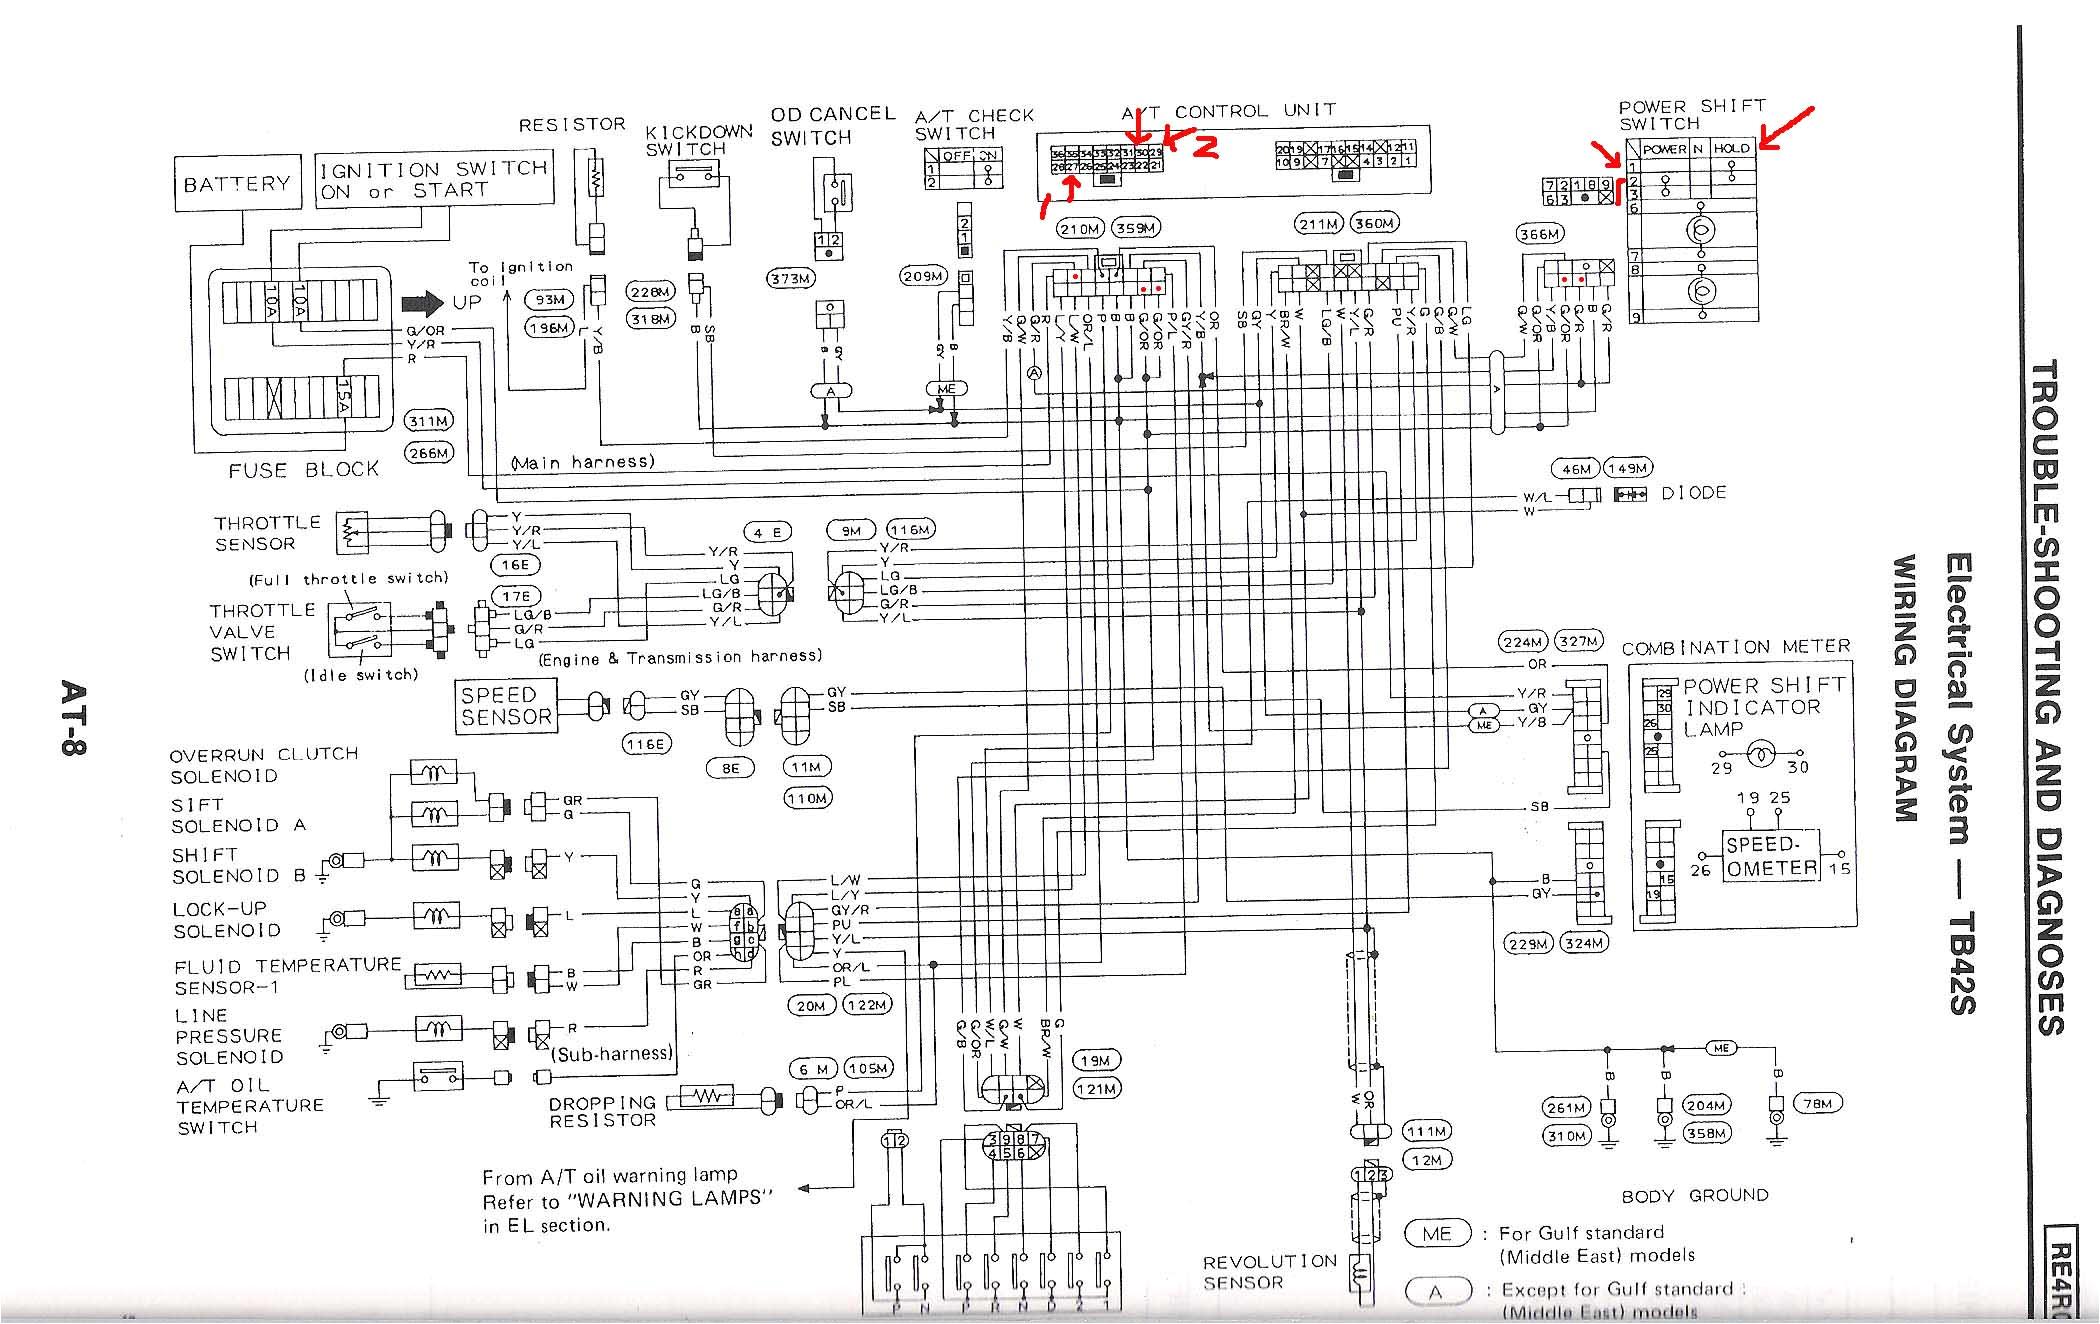 nissan patrol wiring diagram gq wiring diagram show nissan patrol gr y60 wiring diagram nissan patrol